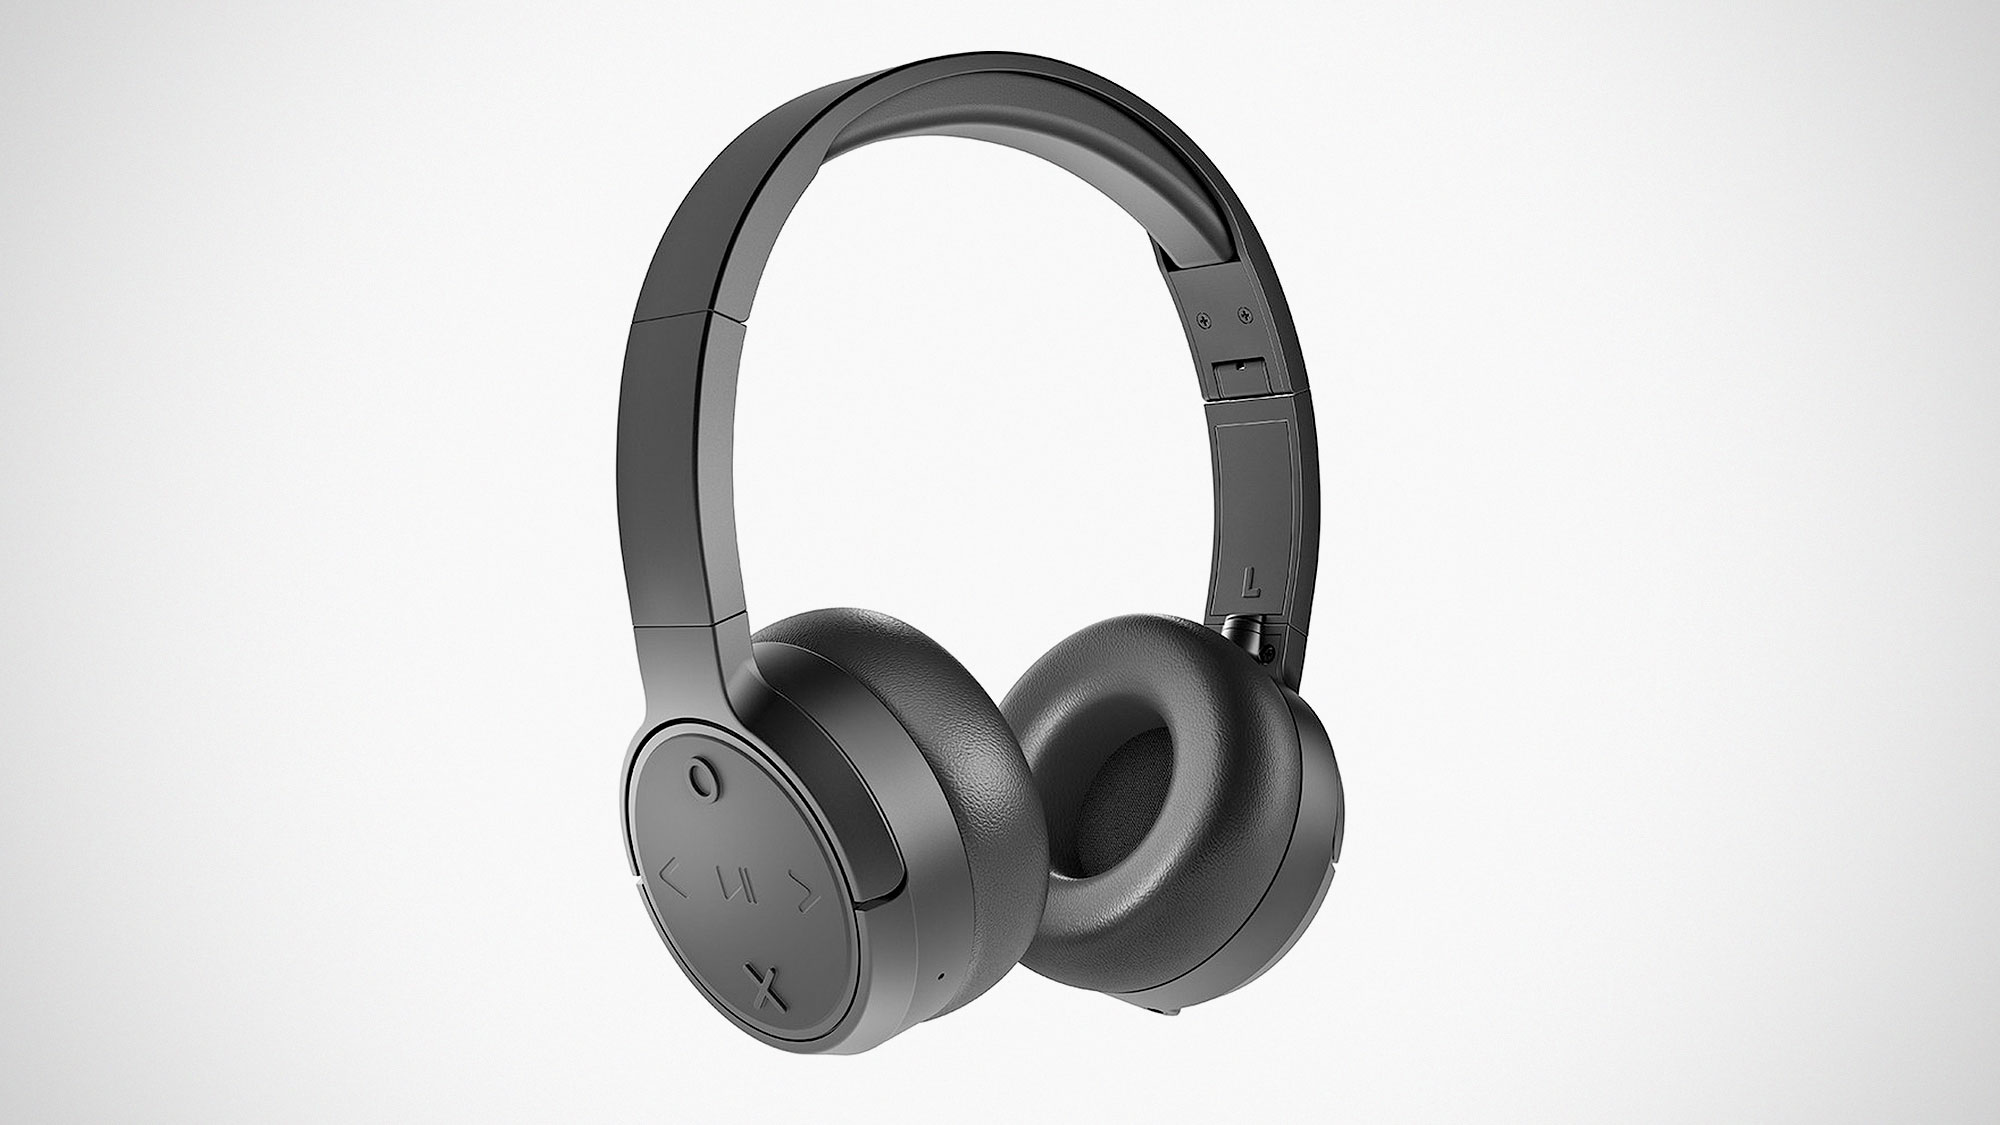 Jam Audio S New Bluetooth Headphones Is Minimal Super Sleek And Cost Just 40 Shouts